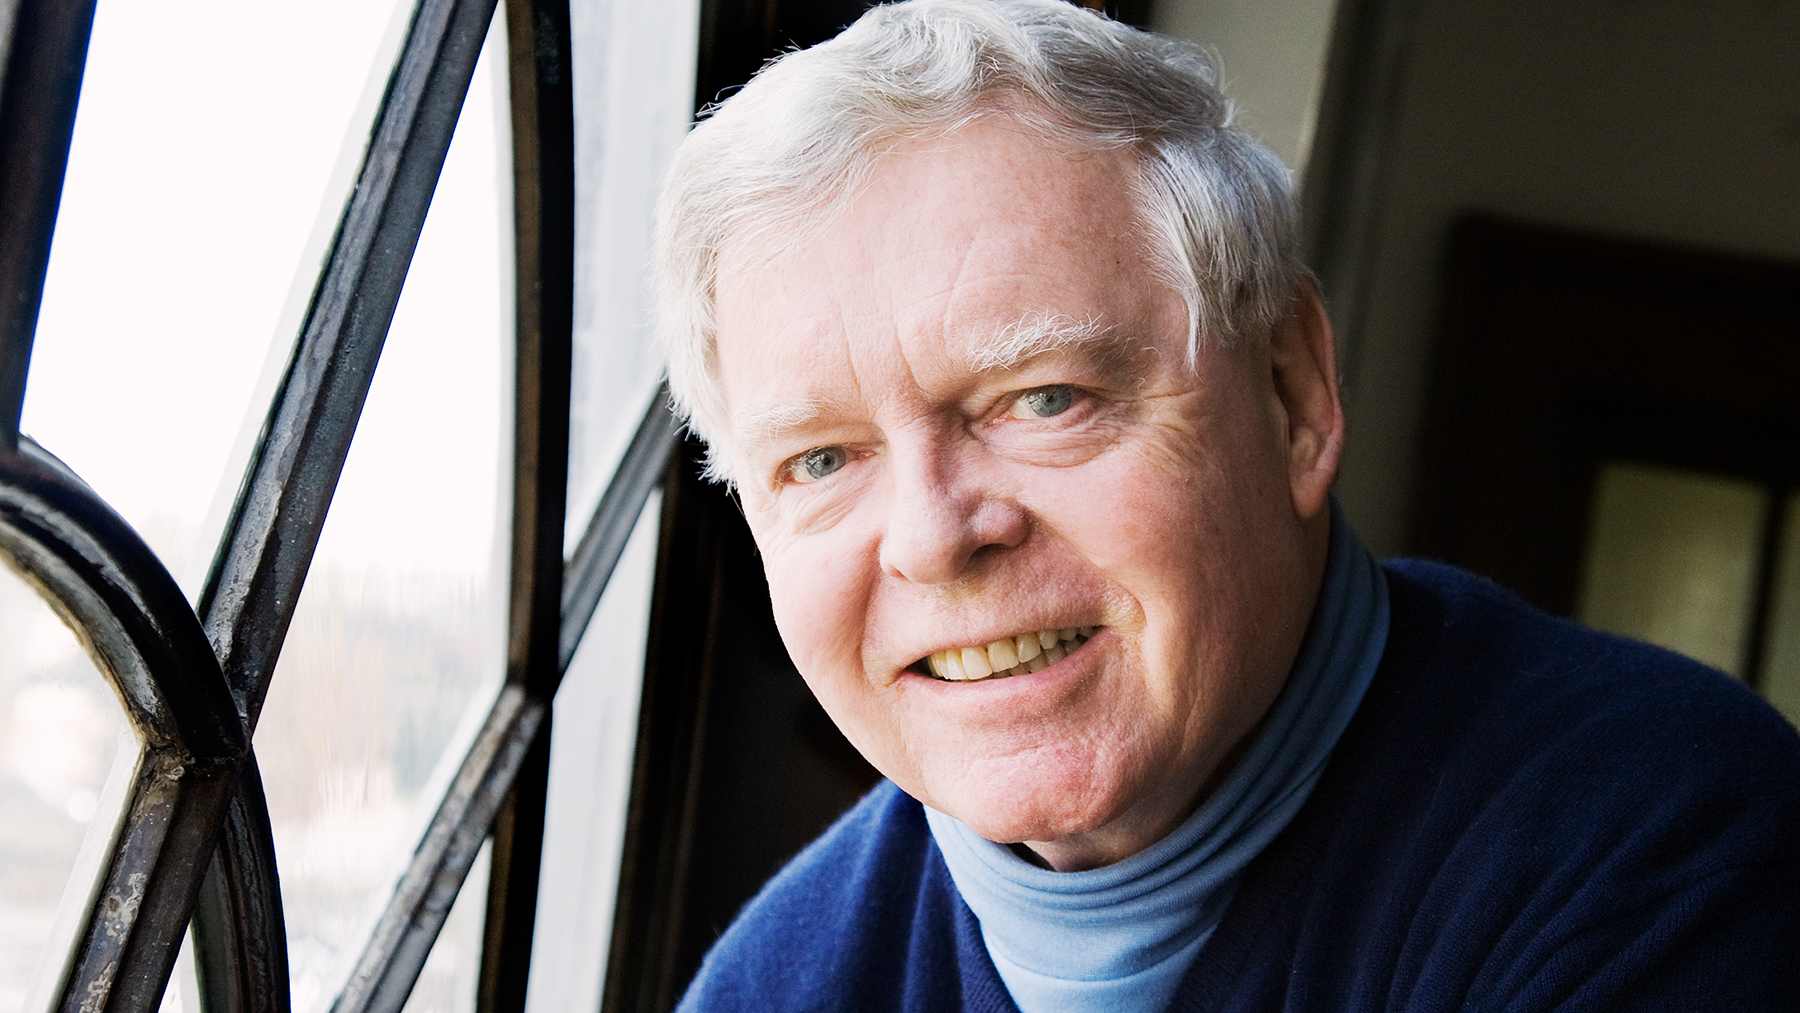 Professor Thomas O'Rourke